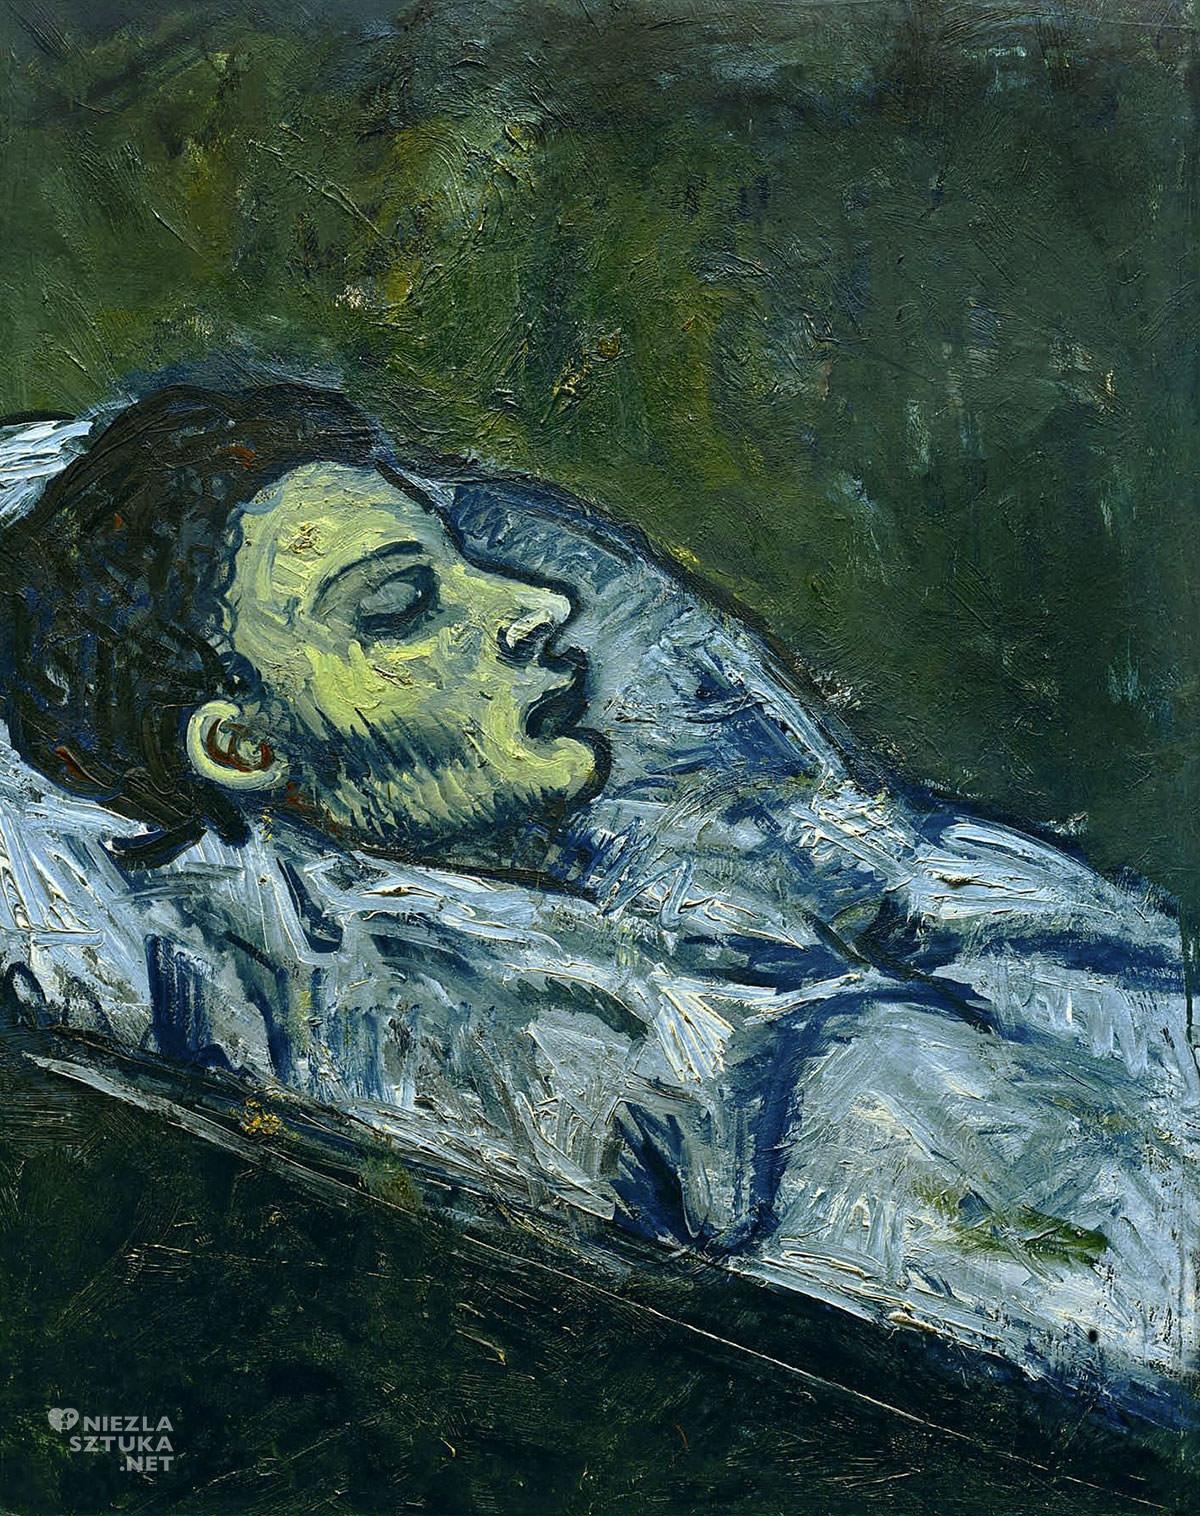 Pablo Picasso, Casagemas w trumnie, śmierć, sztuka XX wieku, Niezła Sztuka